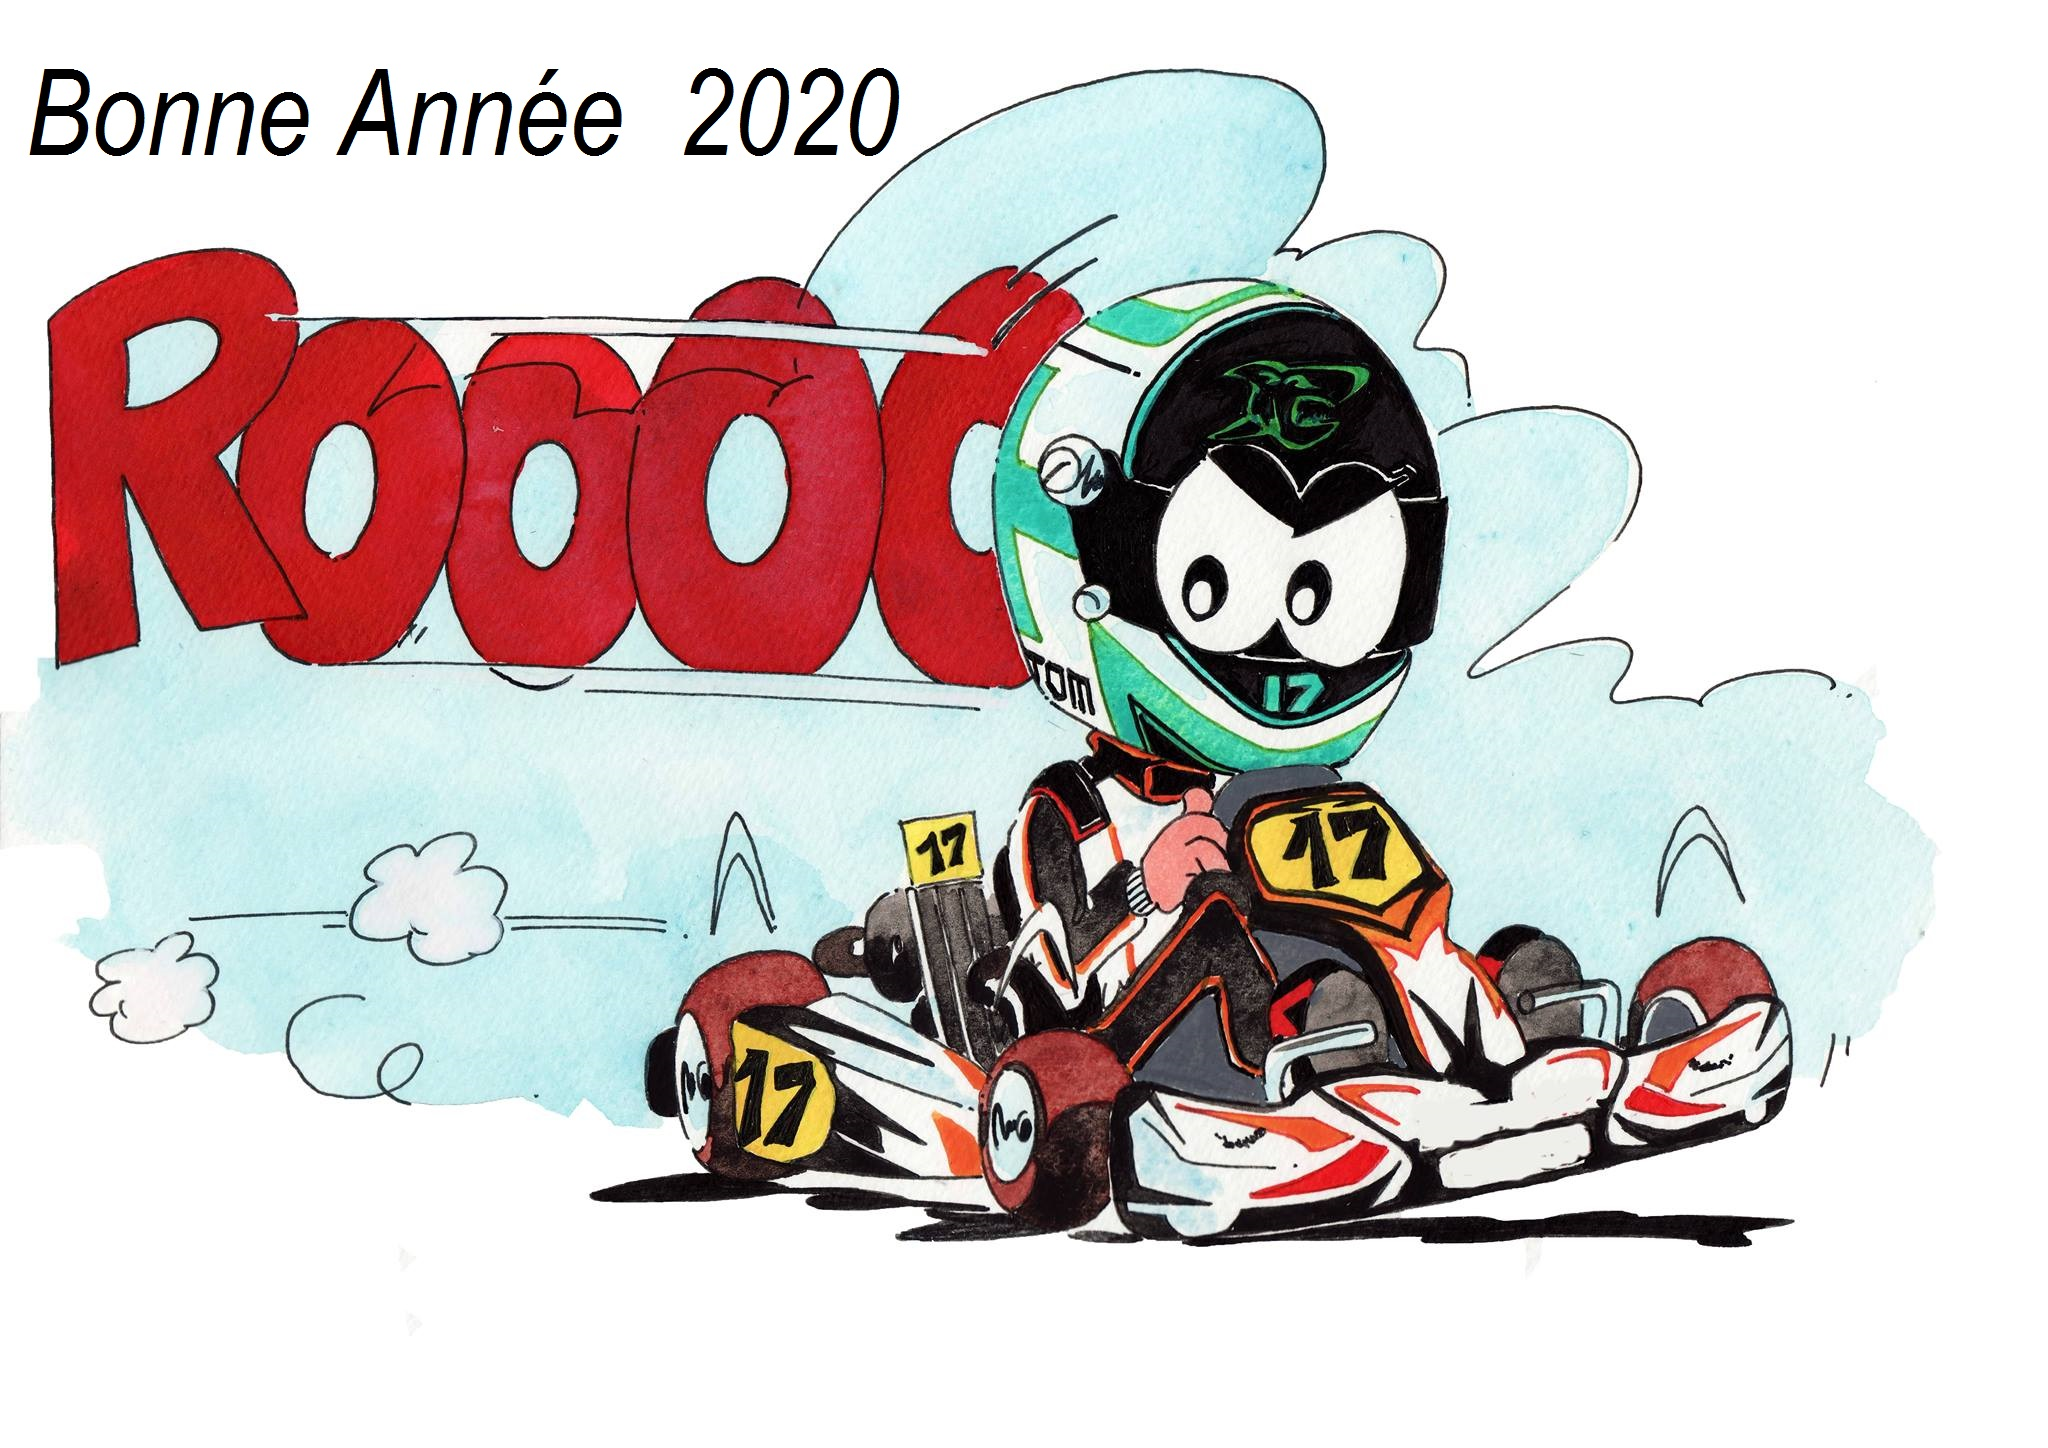 kart bonne année 2020